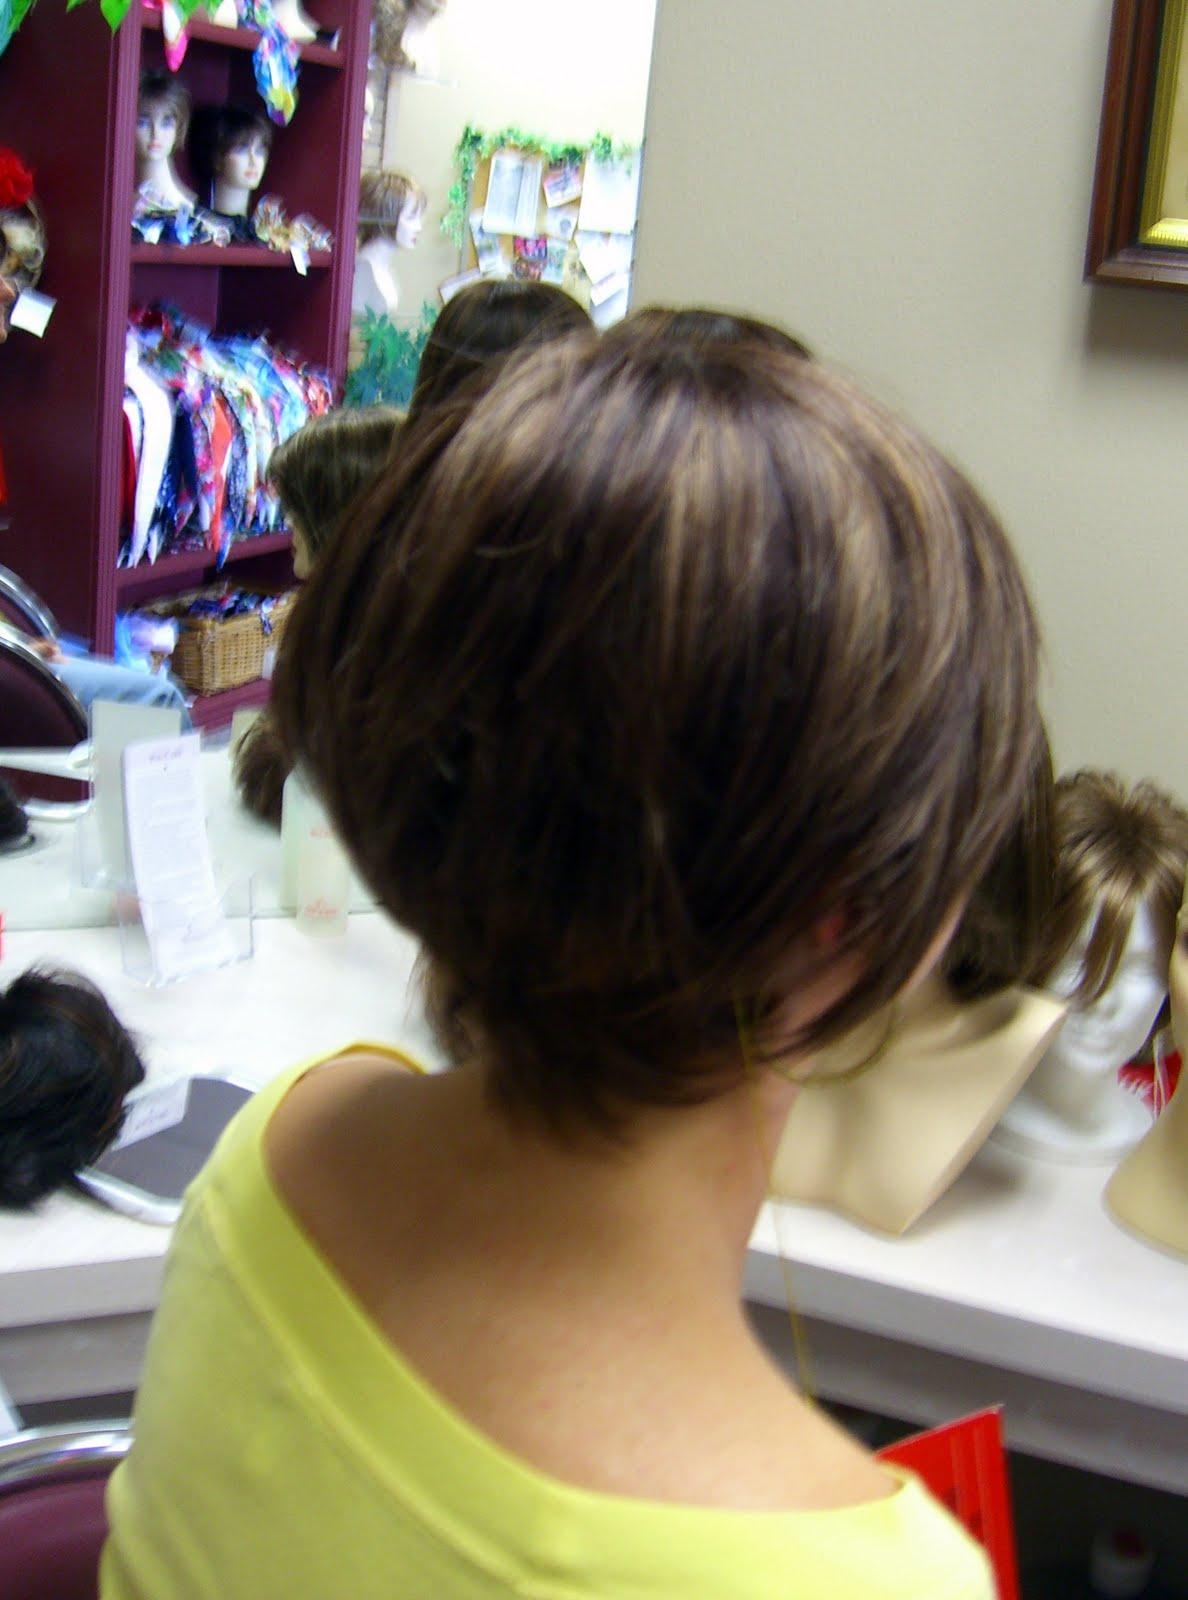 1st photo is a short bob. Too dark & too short for me but a cute cut